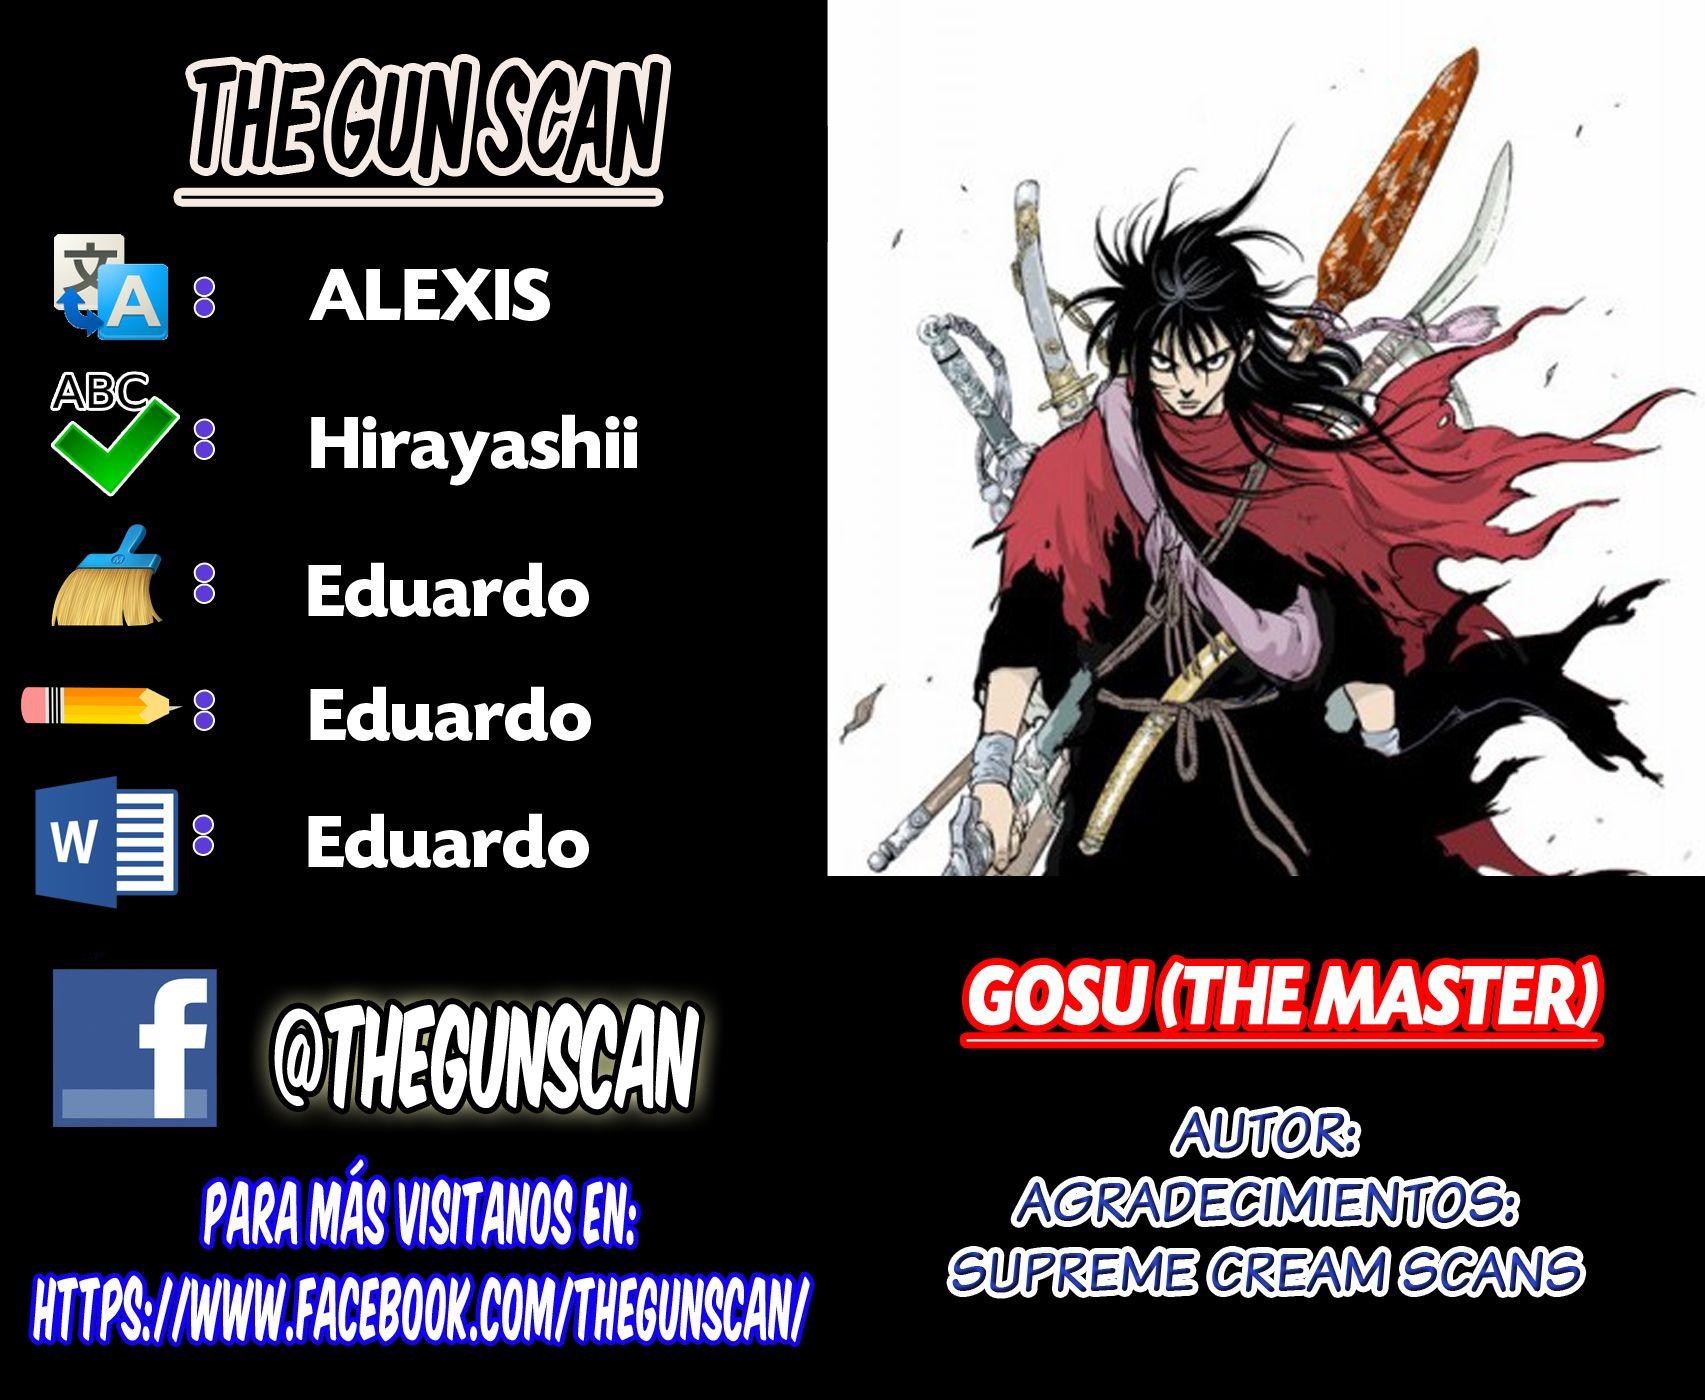 https://c5.ninemanga.com/es_manga/9/18249/485739/6bbd80b04535d39be5e02dbfd8730469.jpg Page 1